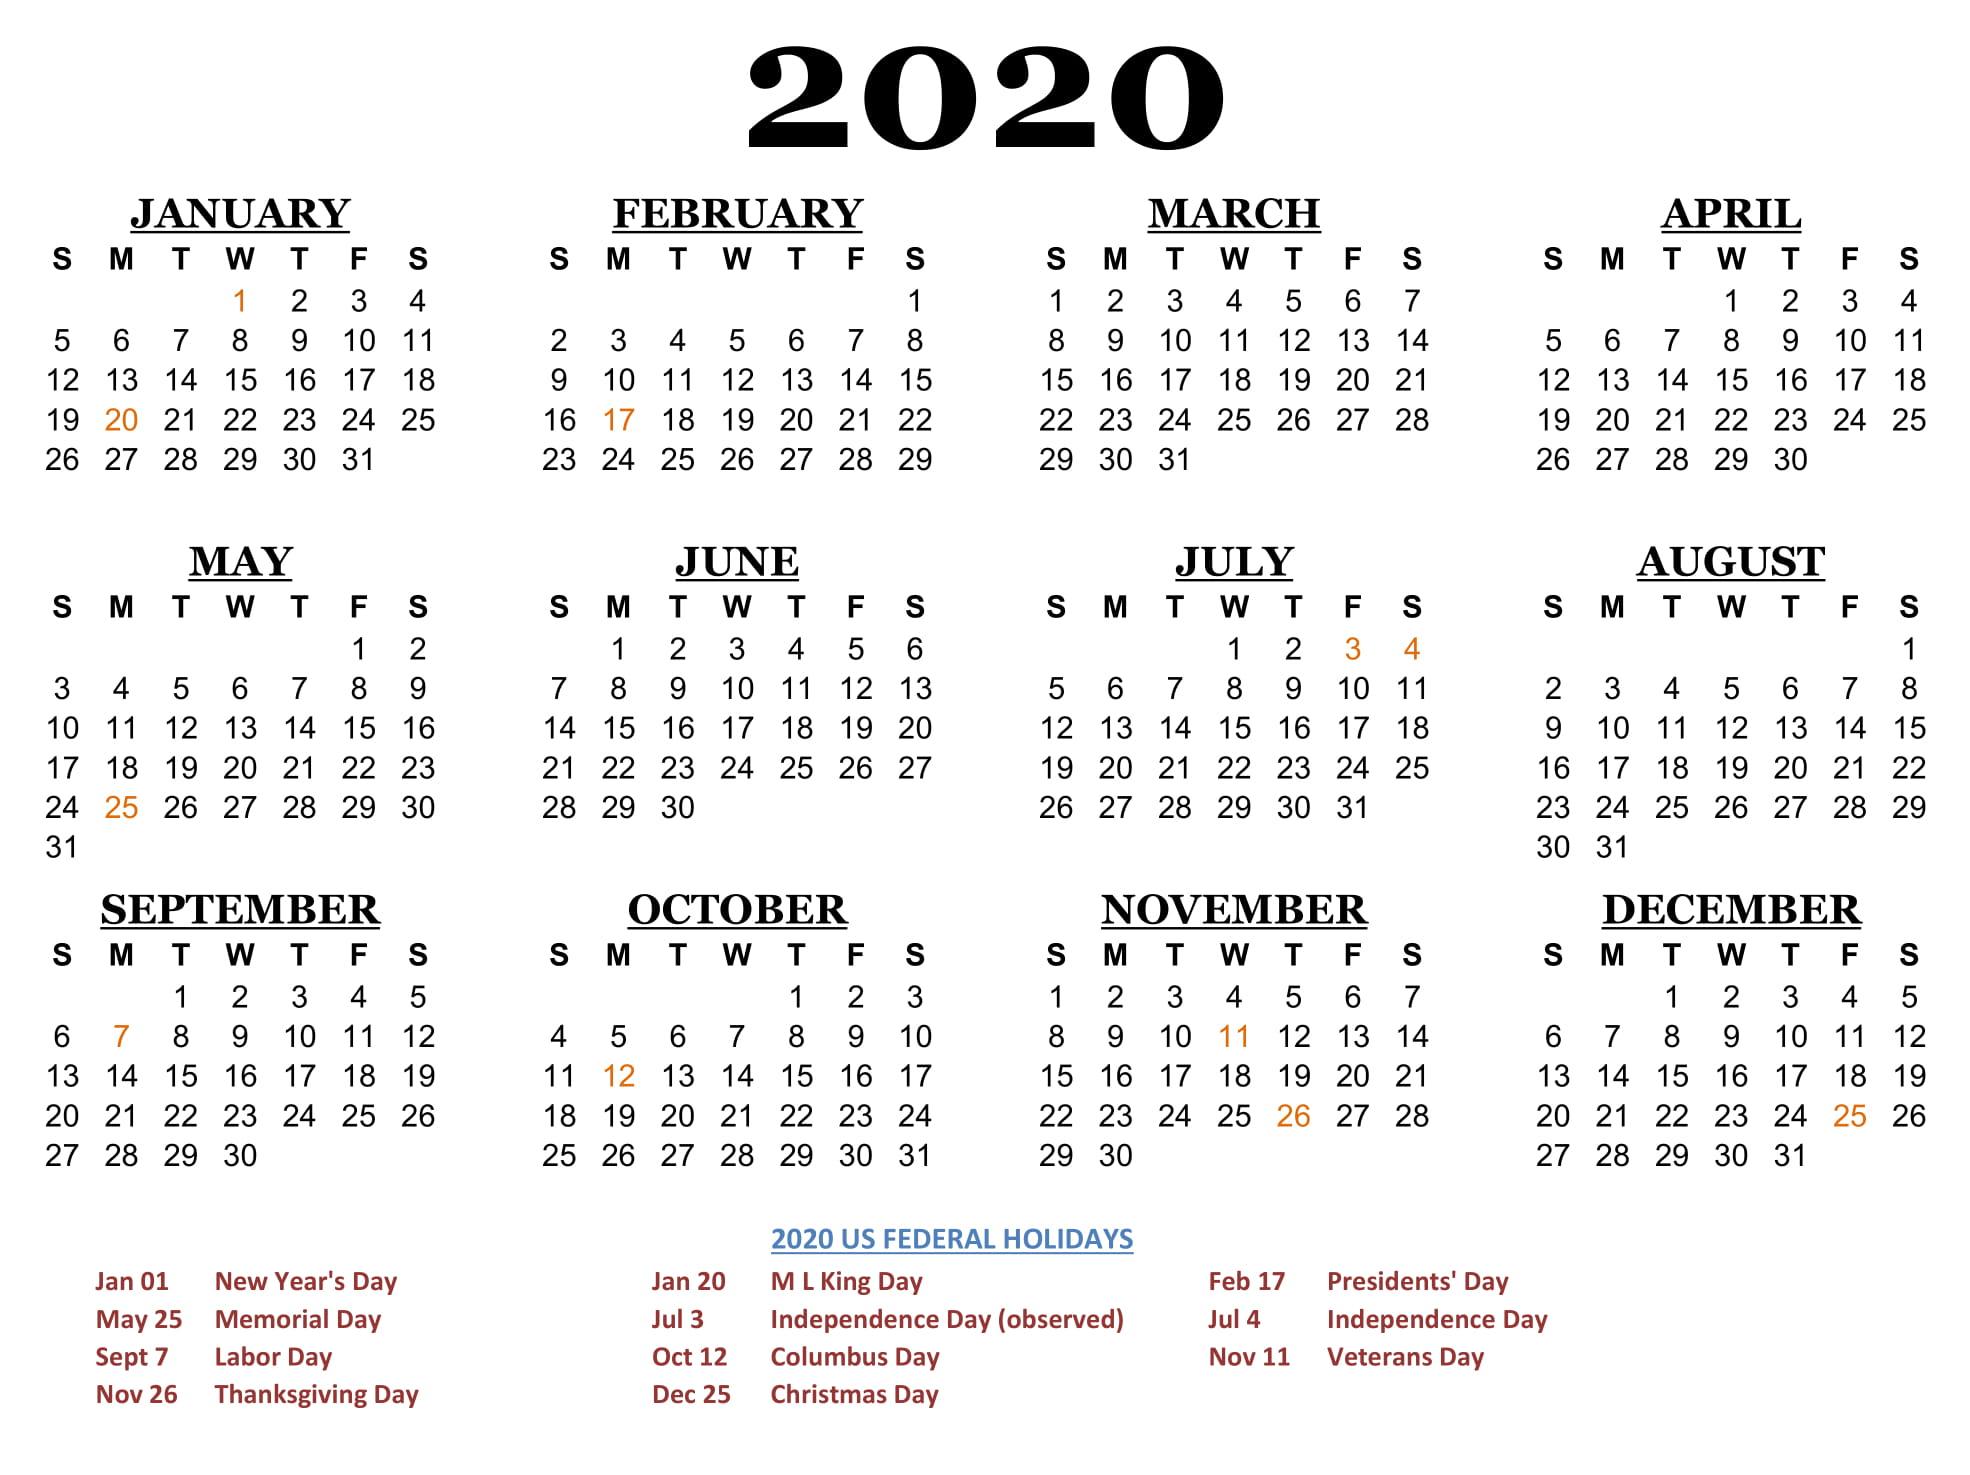 Free Calendar 2020 Printable Yearly | 12 Month Printable intended for Yearly Printable Calendar 2020